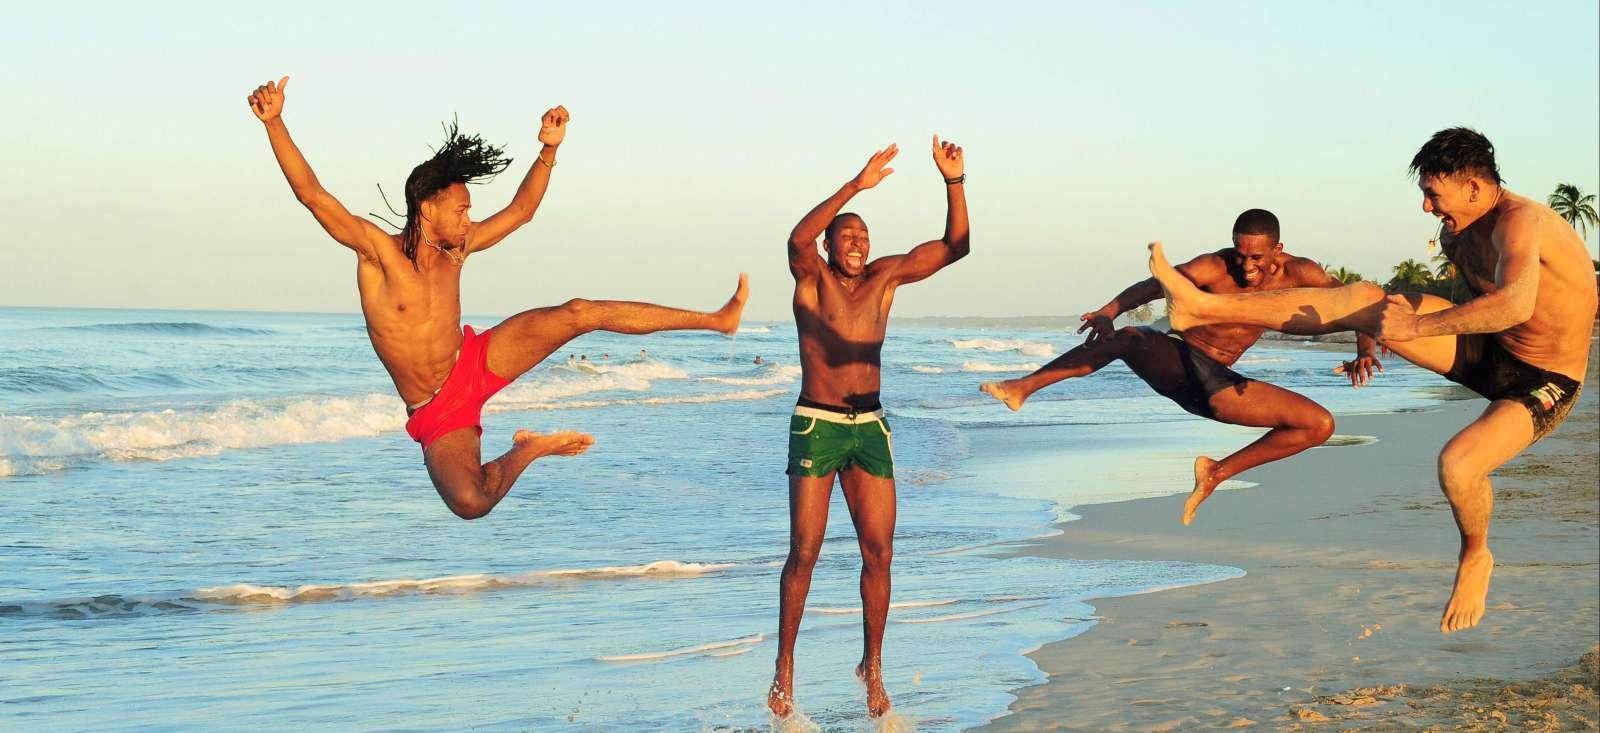 Voyage à pied : Rando & Caraïbes